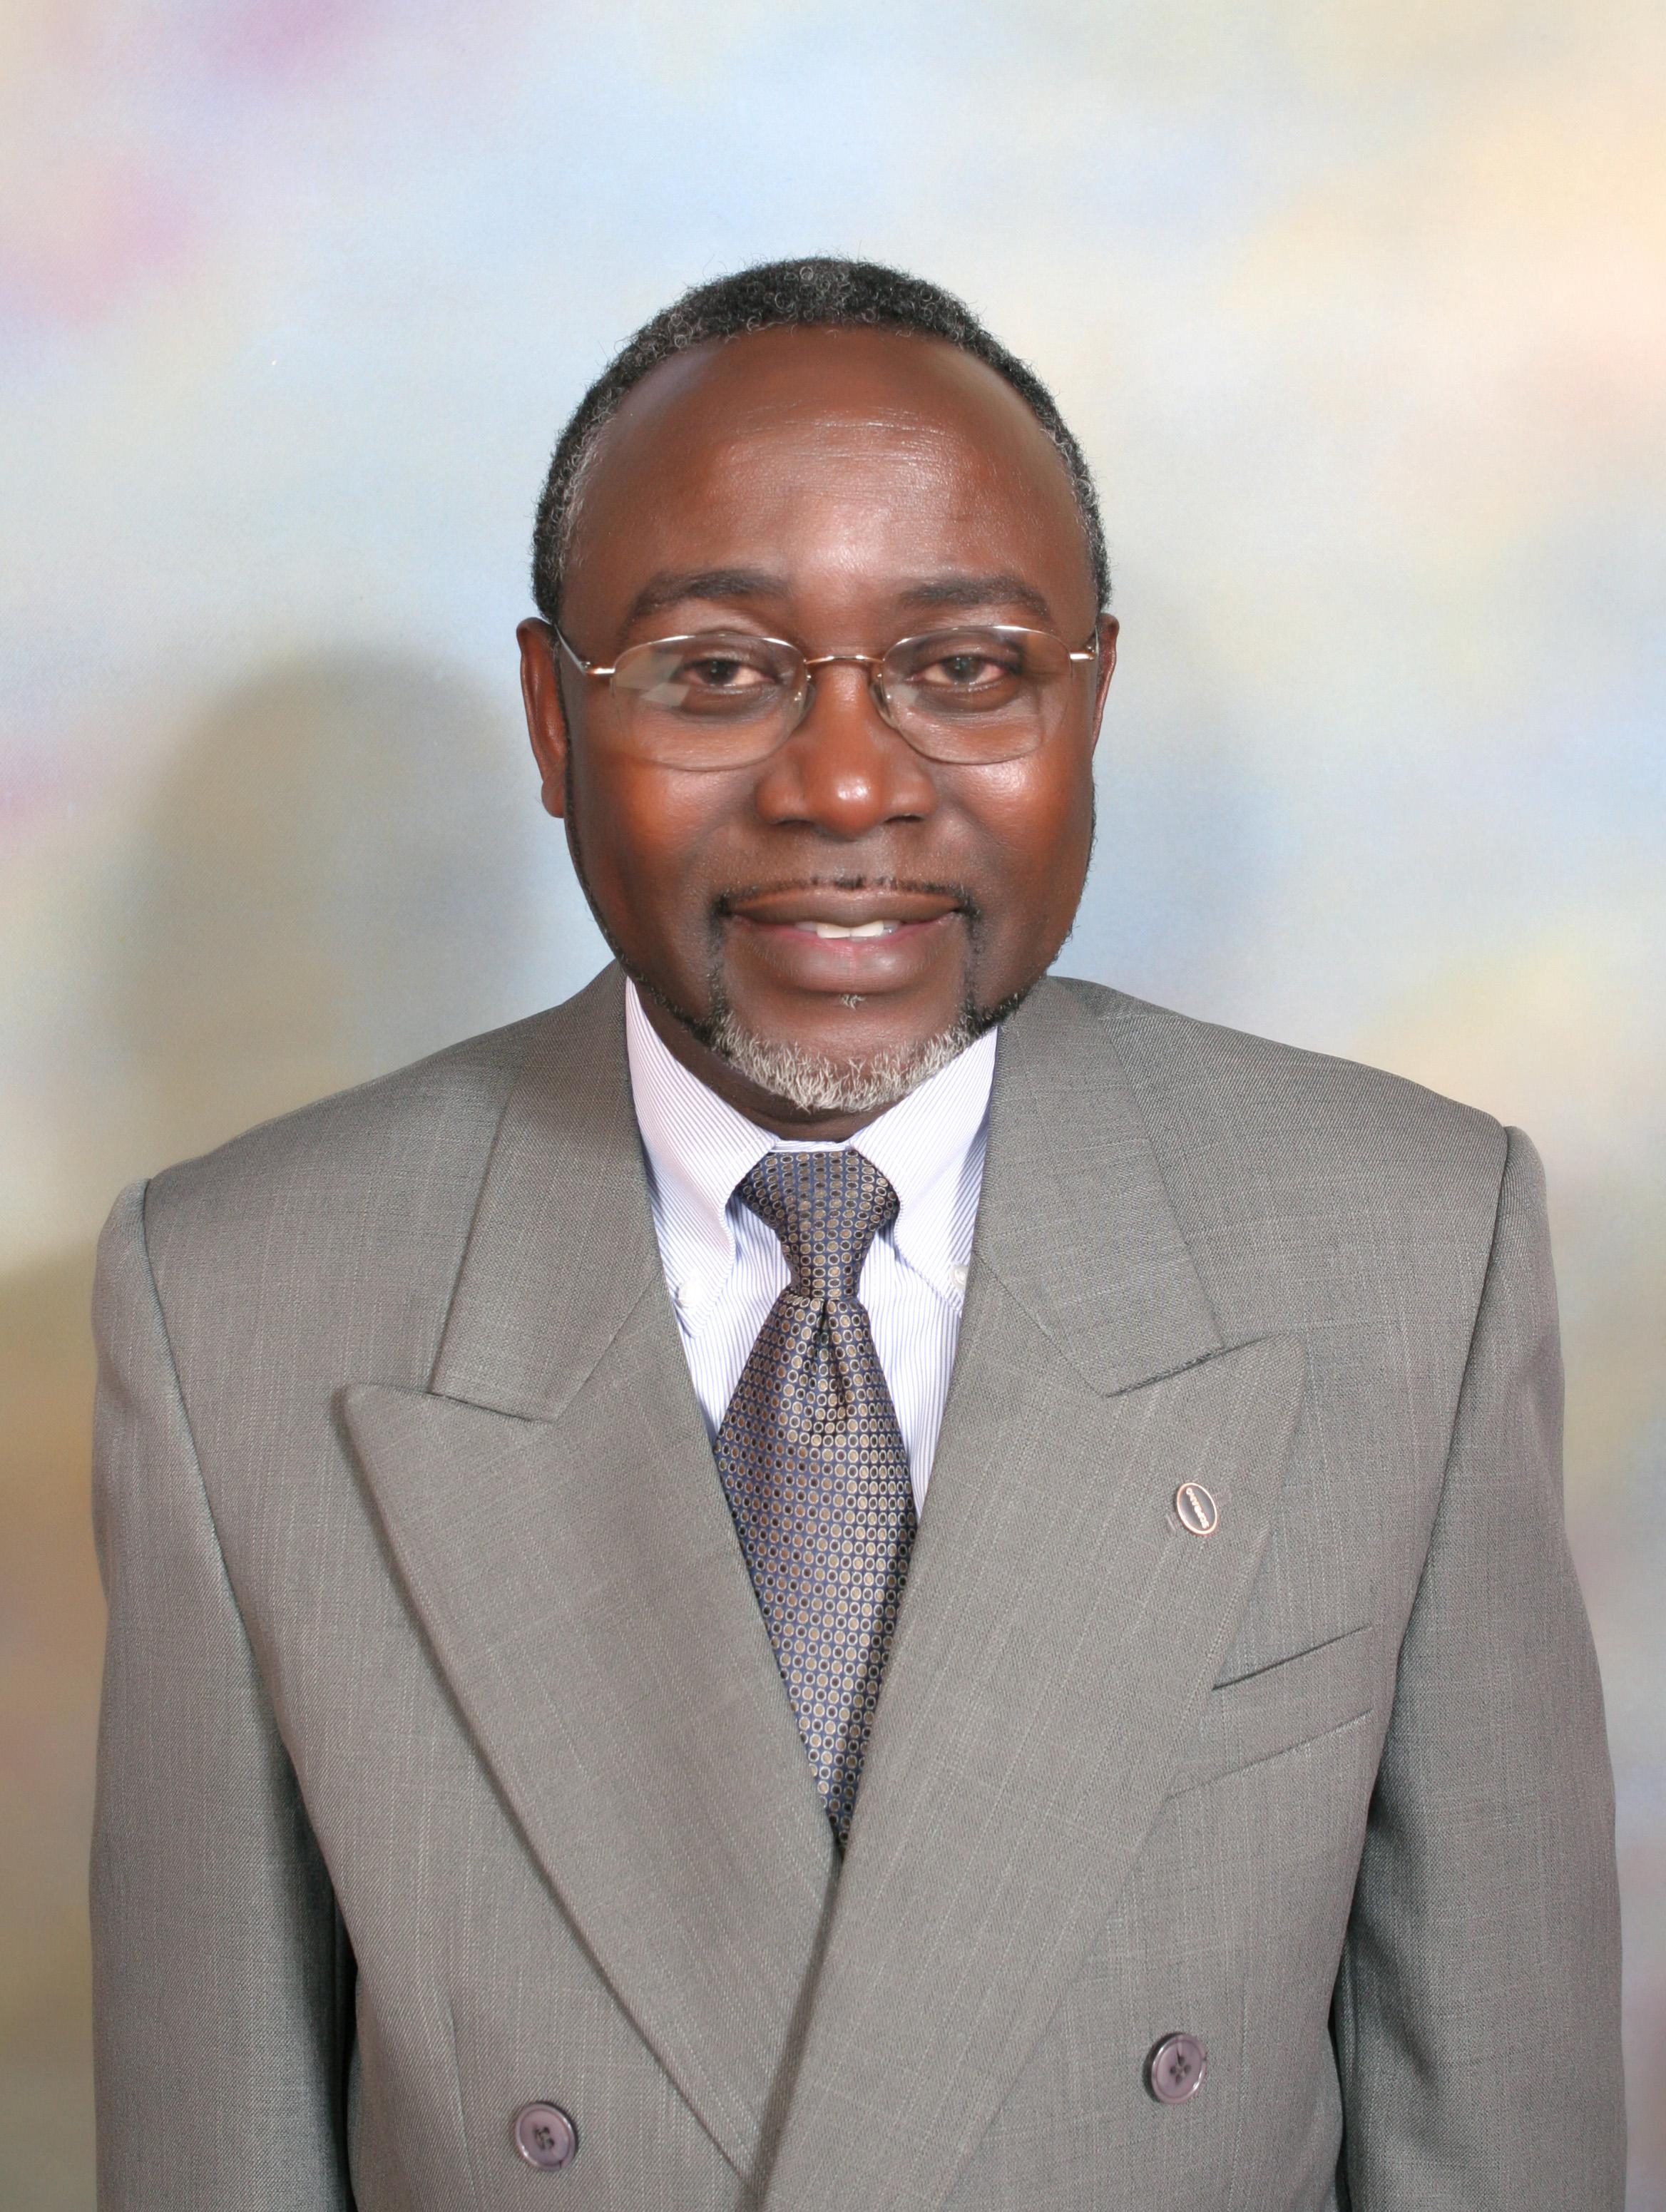 Pastor Emmanuel Osei    Church Pastor 2009 - Present